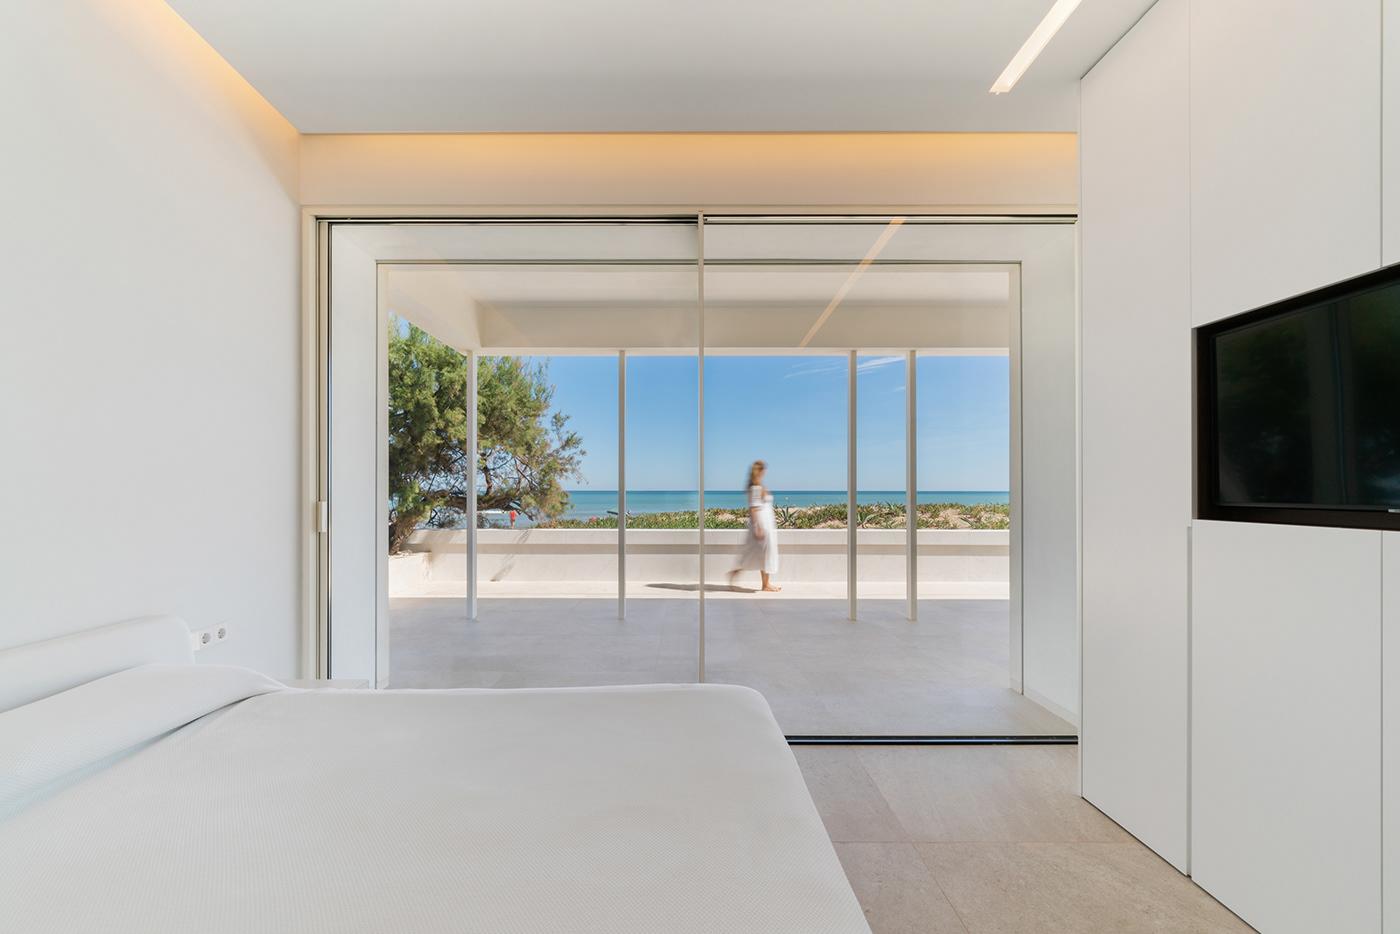 architect architecture Beach house building design dune minimal modern Photography  spain